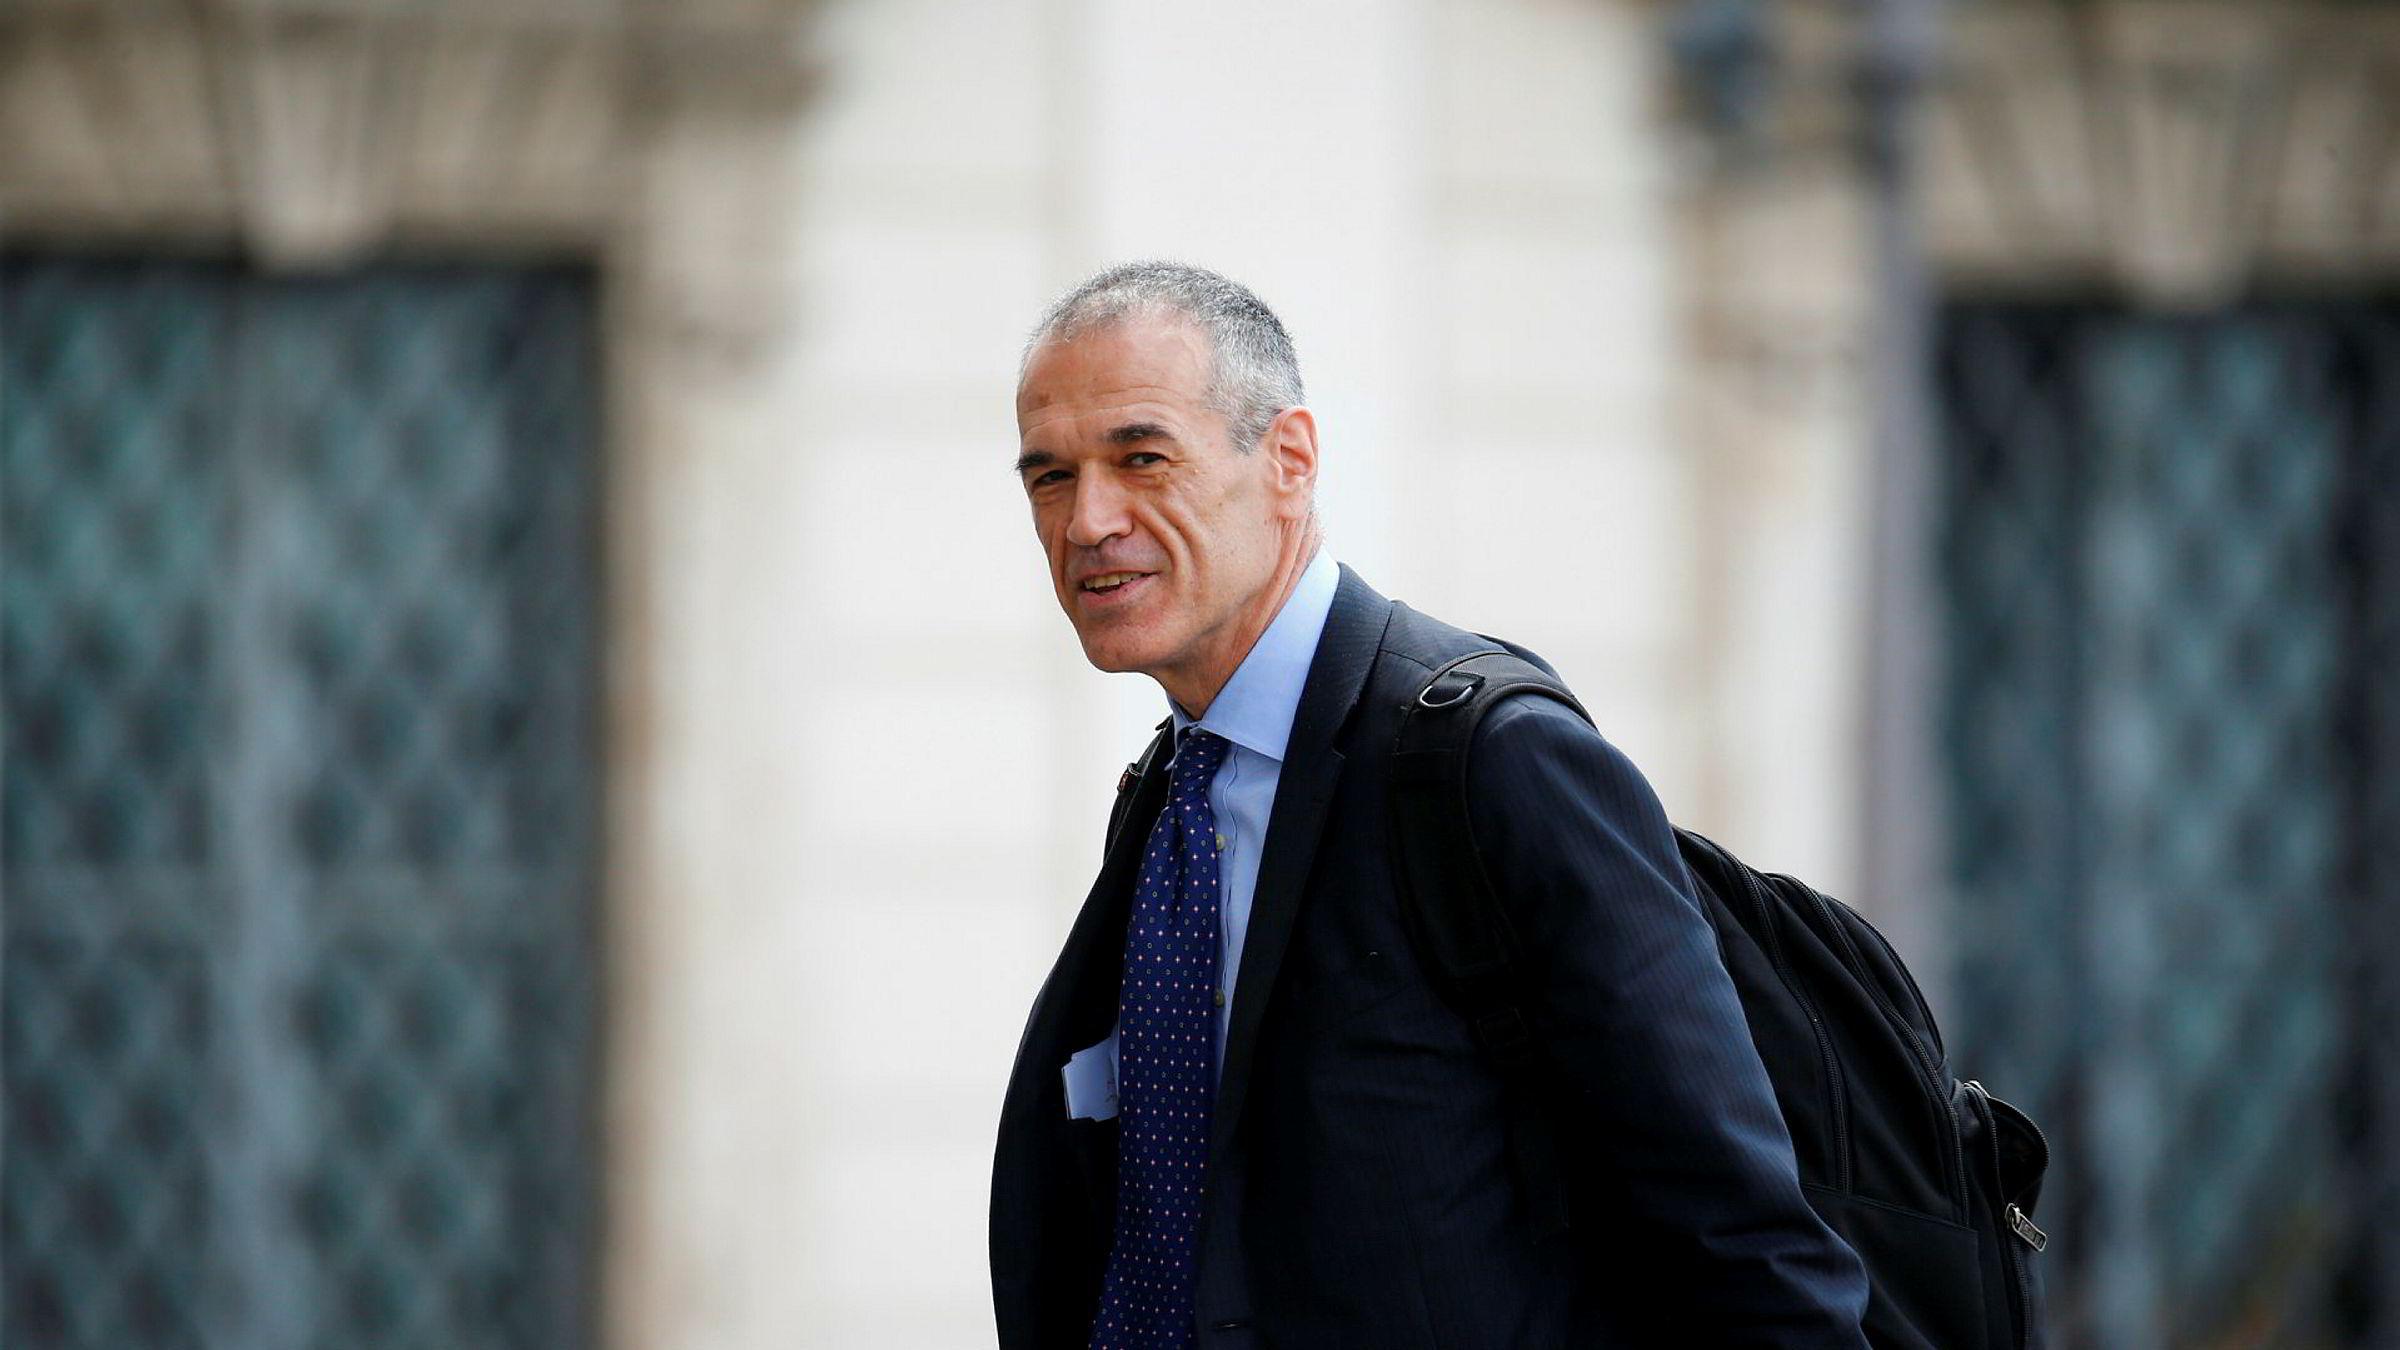 Tidligere IMF-topp Carlo Cottarelli ankommer møtet med president Sergio Mattarella Quirinal Palace i Roma mandag.